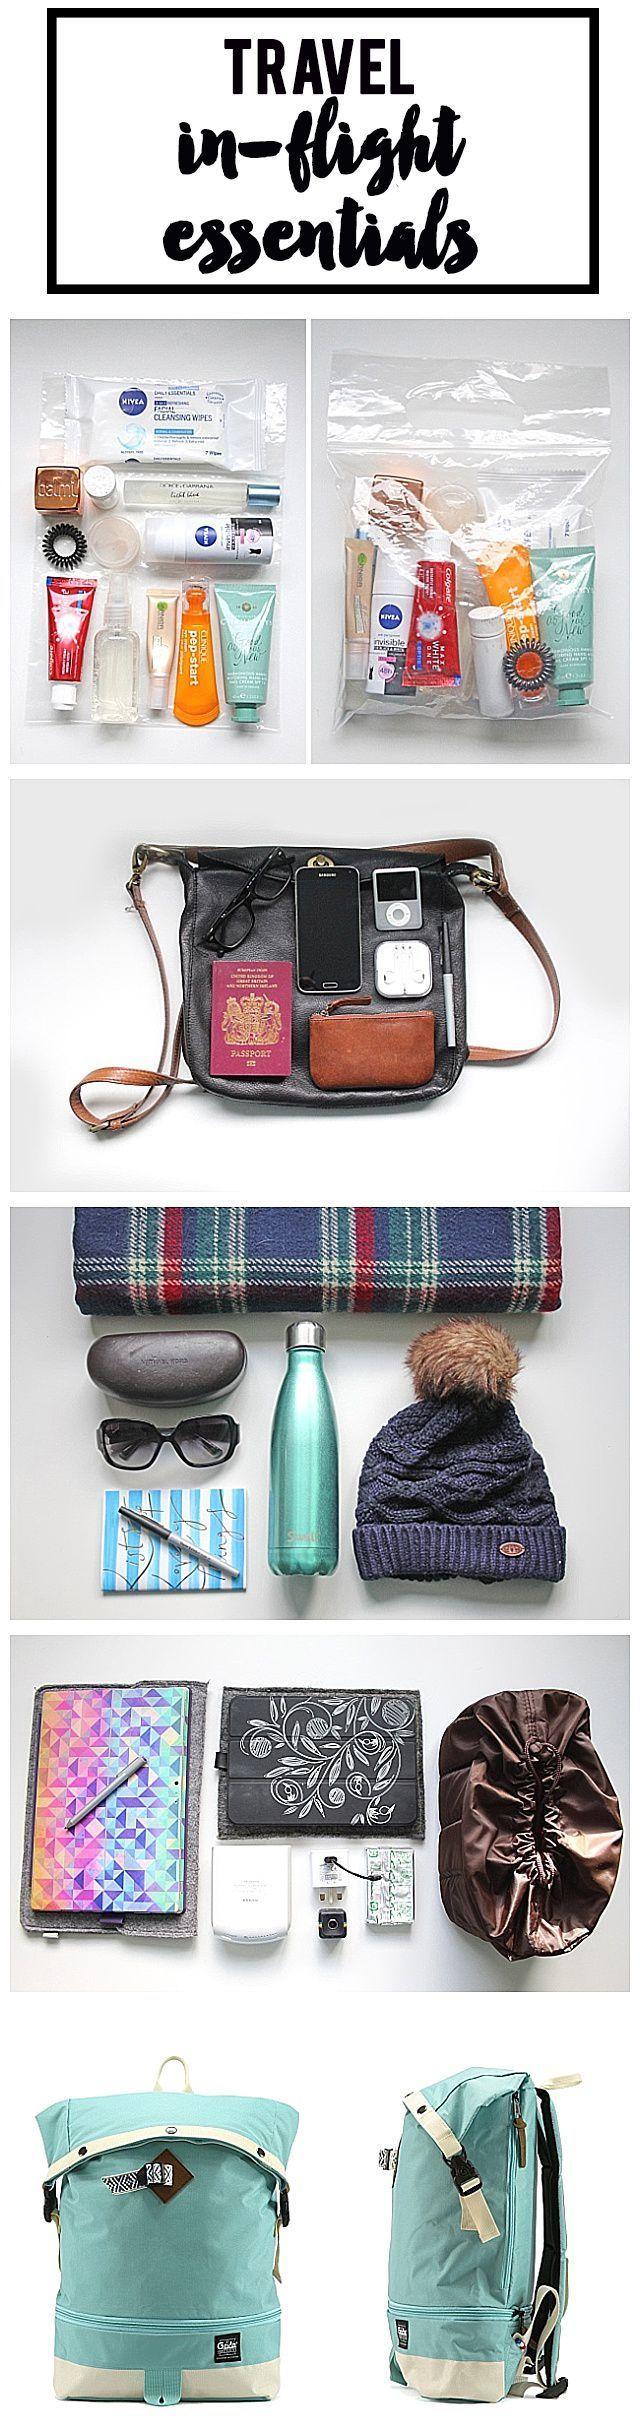 Travel: My carry-on flight essentials